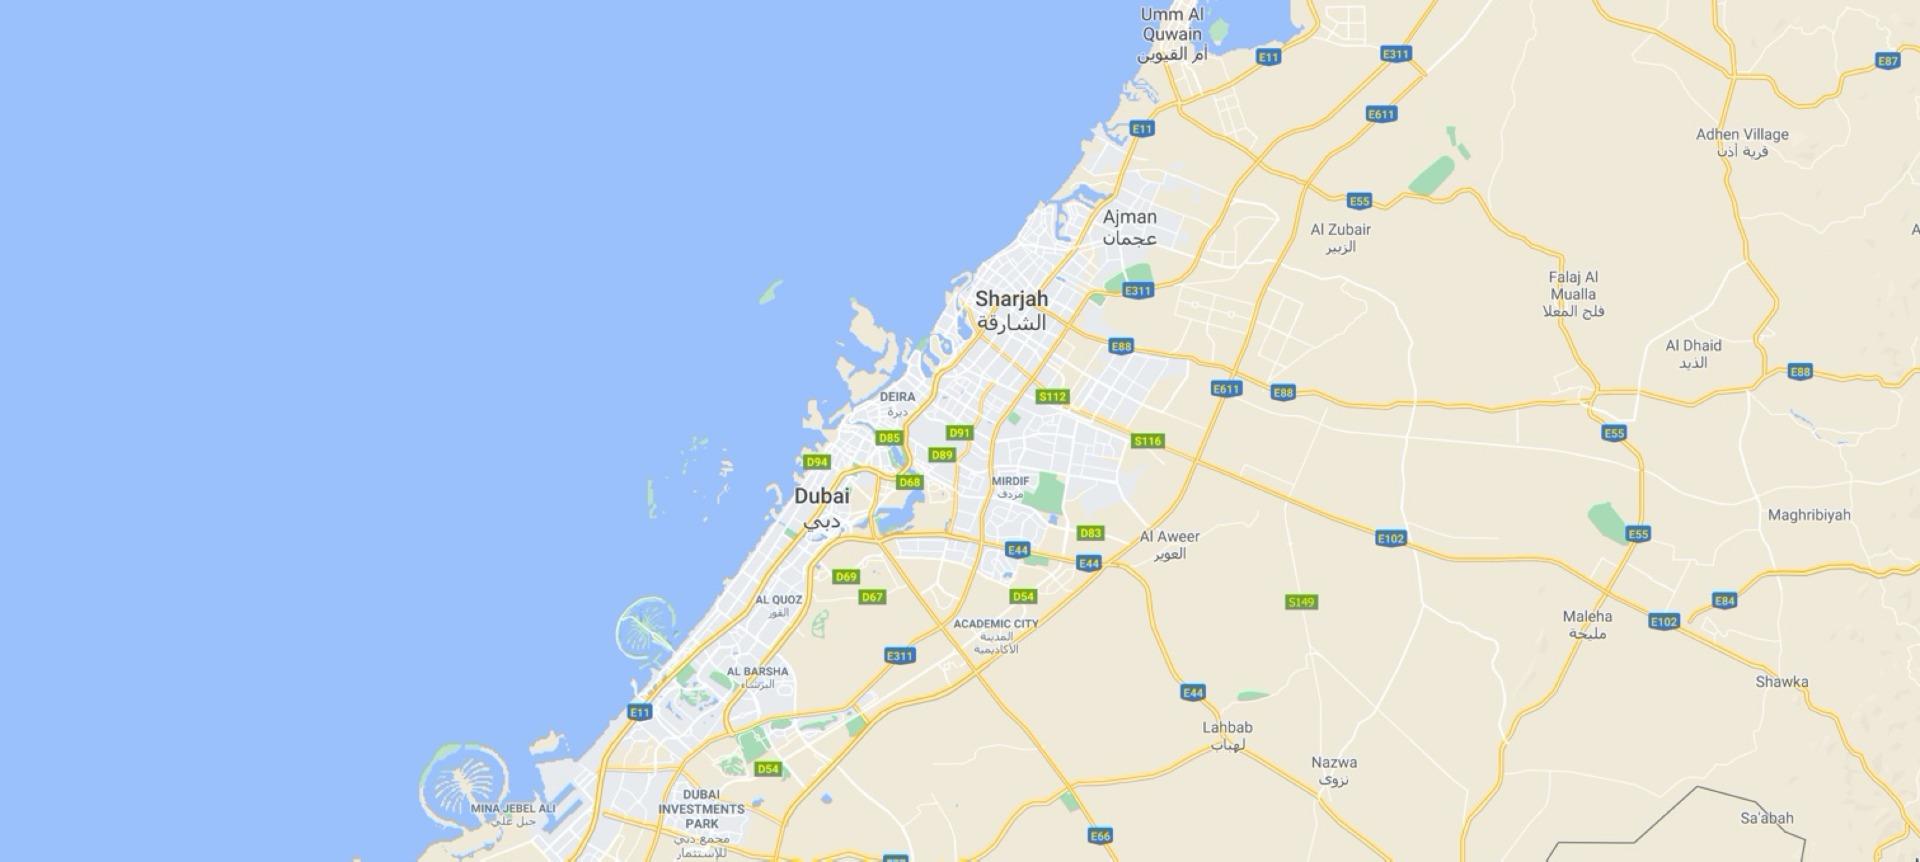 Speedex stores location map